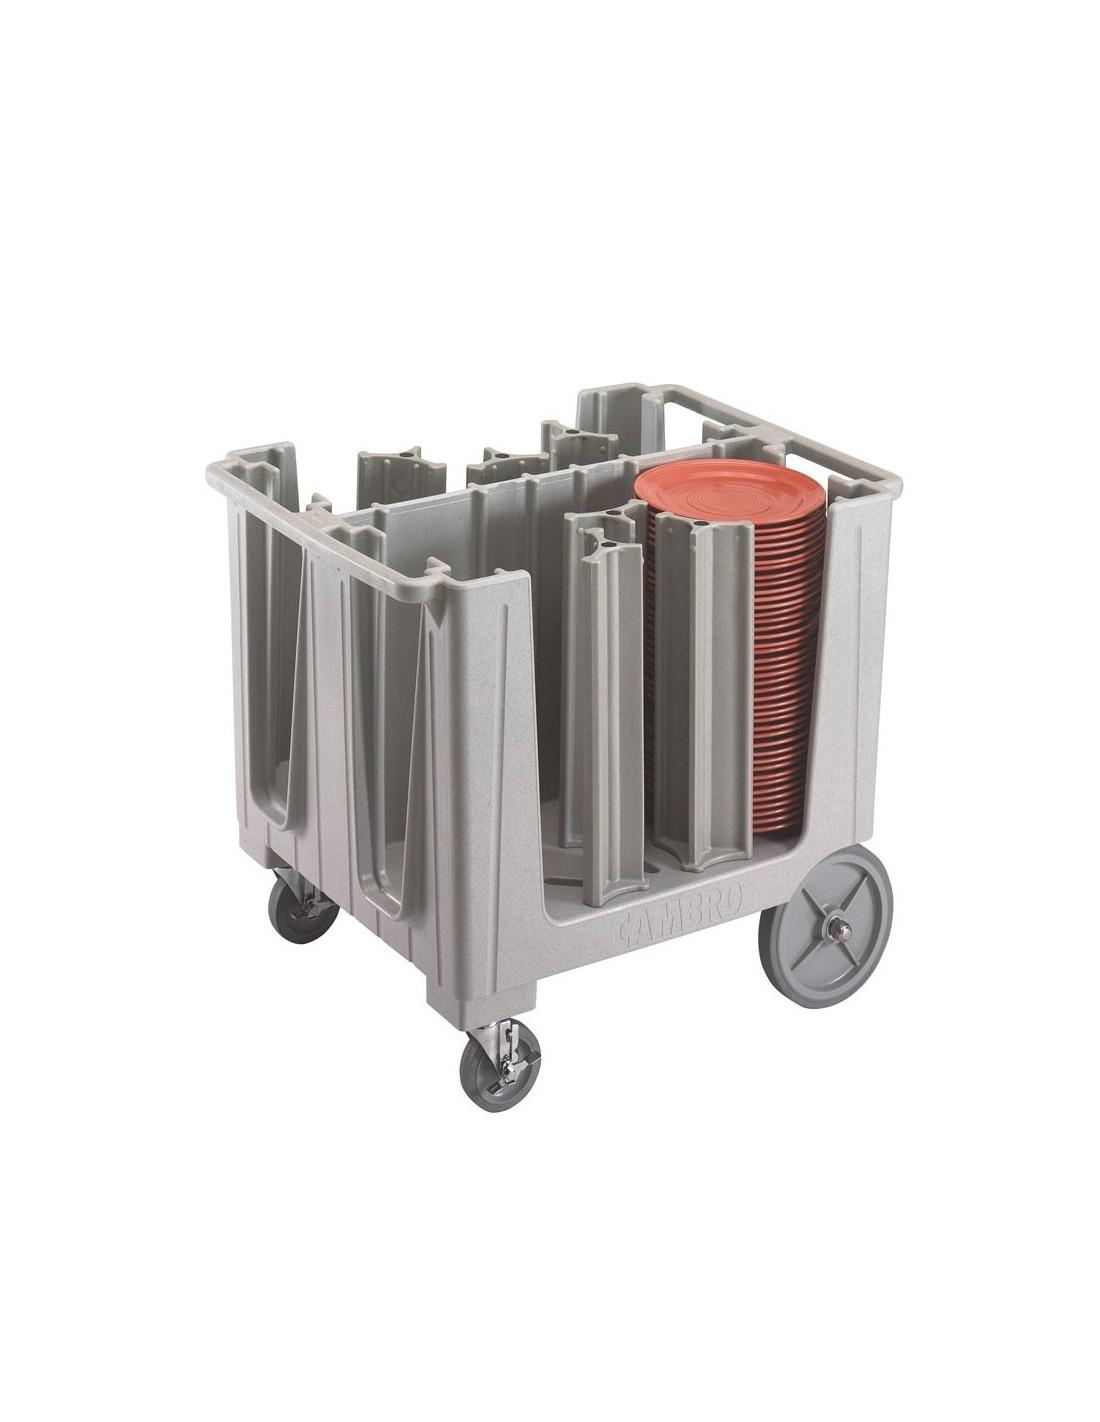 Carro para platos cambro adcs401 for Carros para transportar